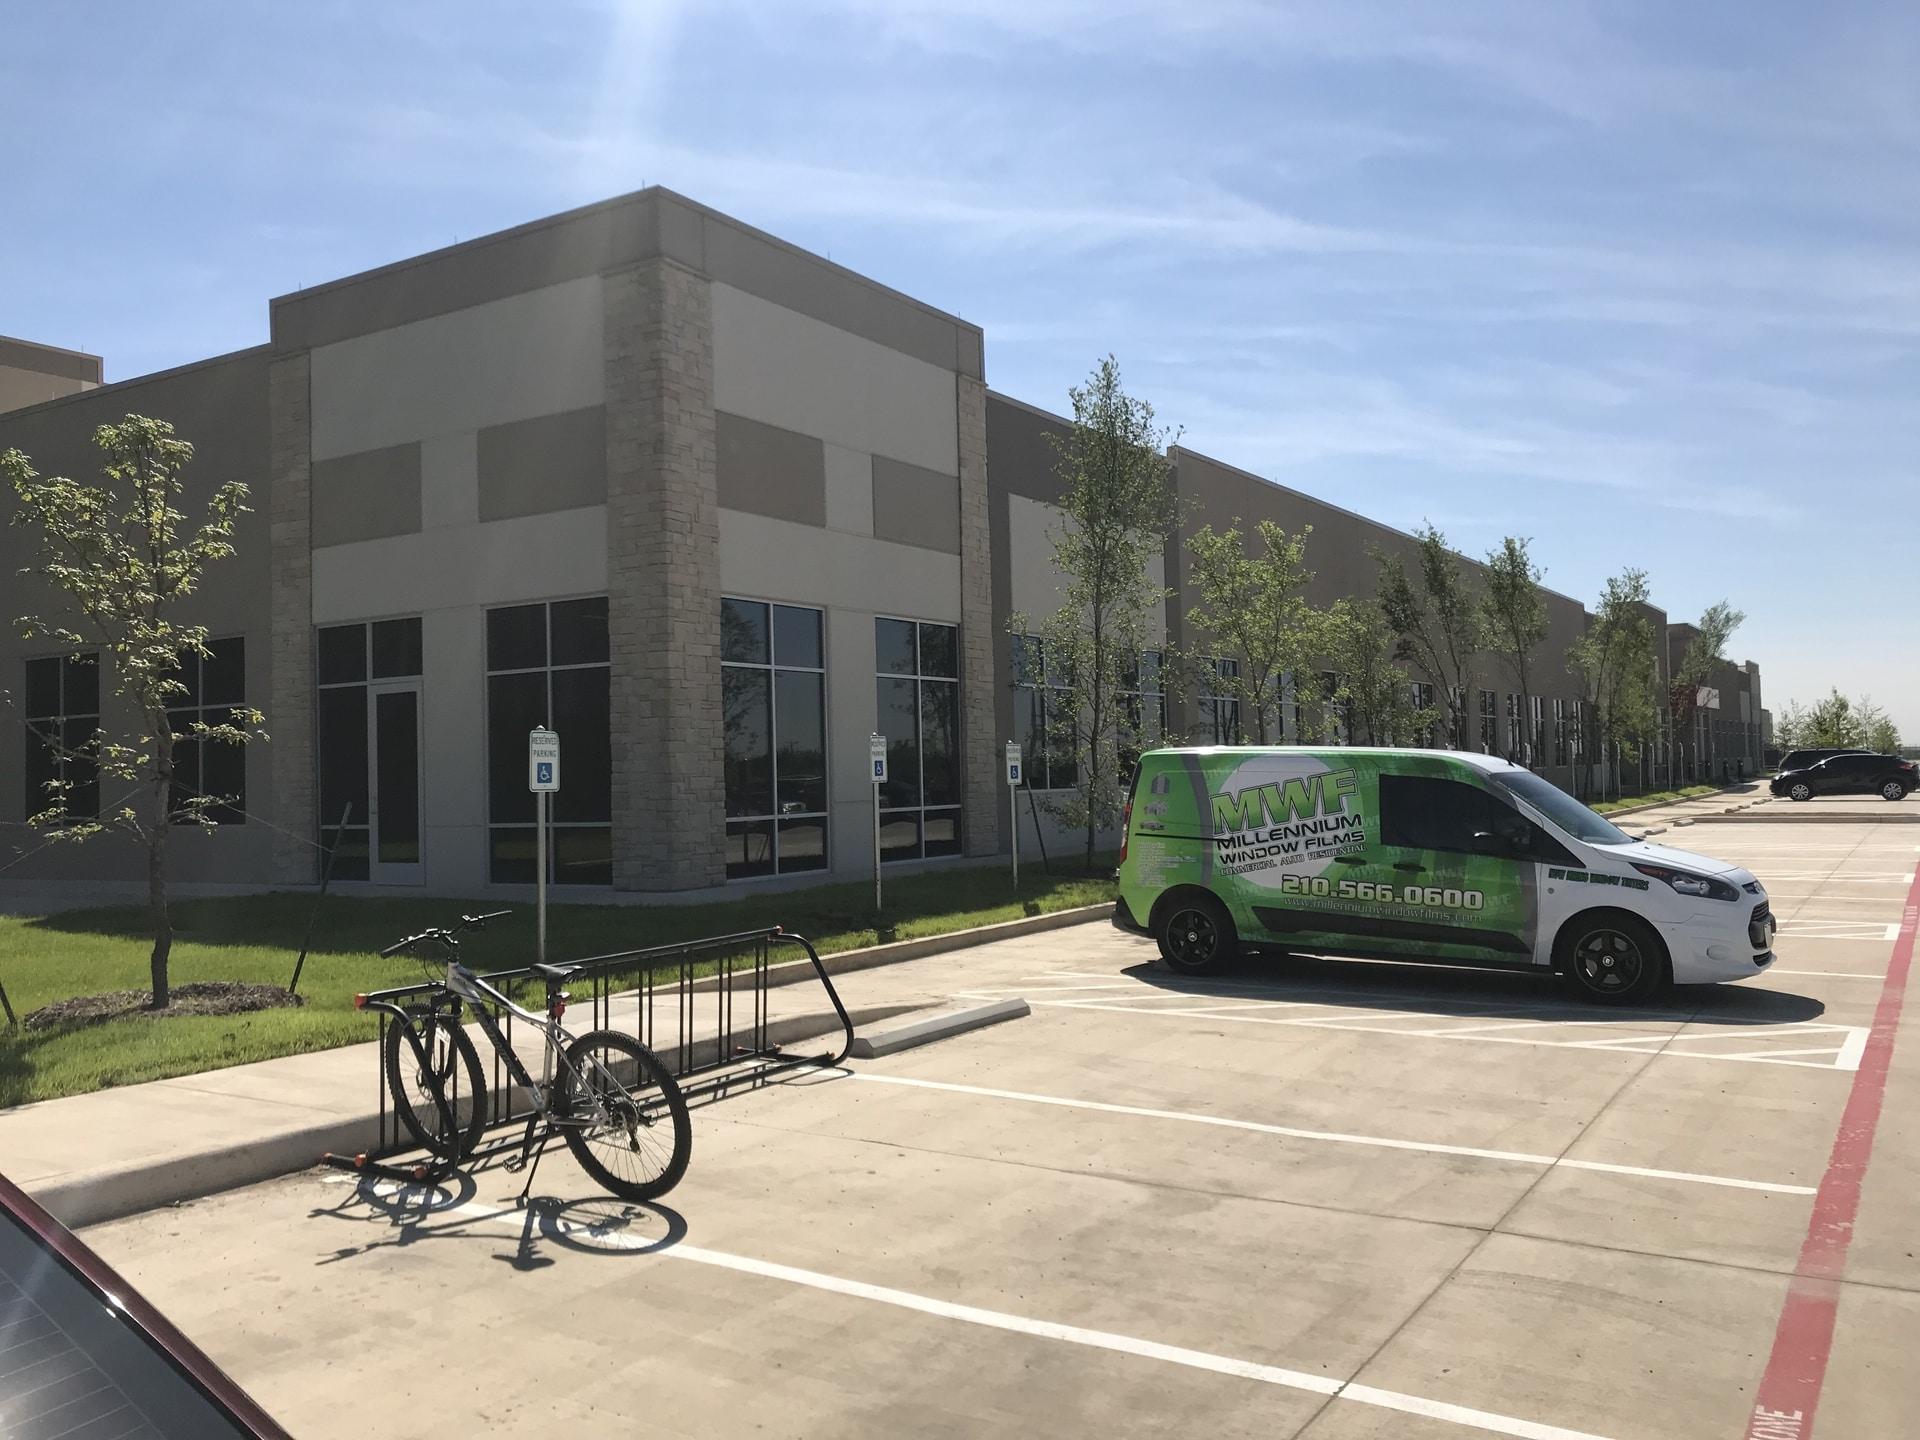 TJ MAXX Distribution Center WIndow FIlm Outdoor